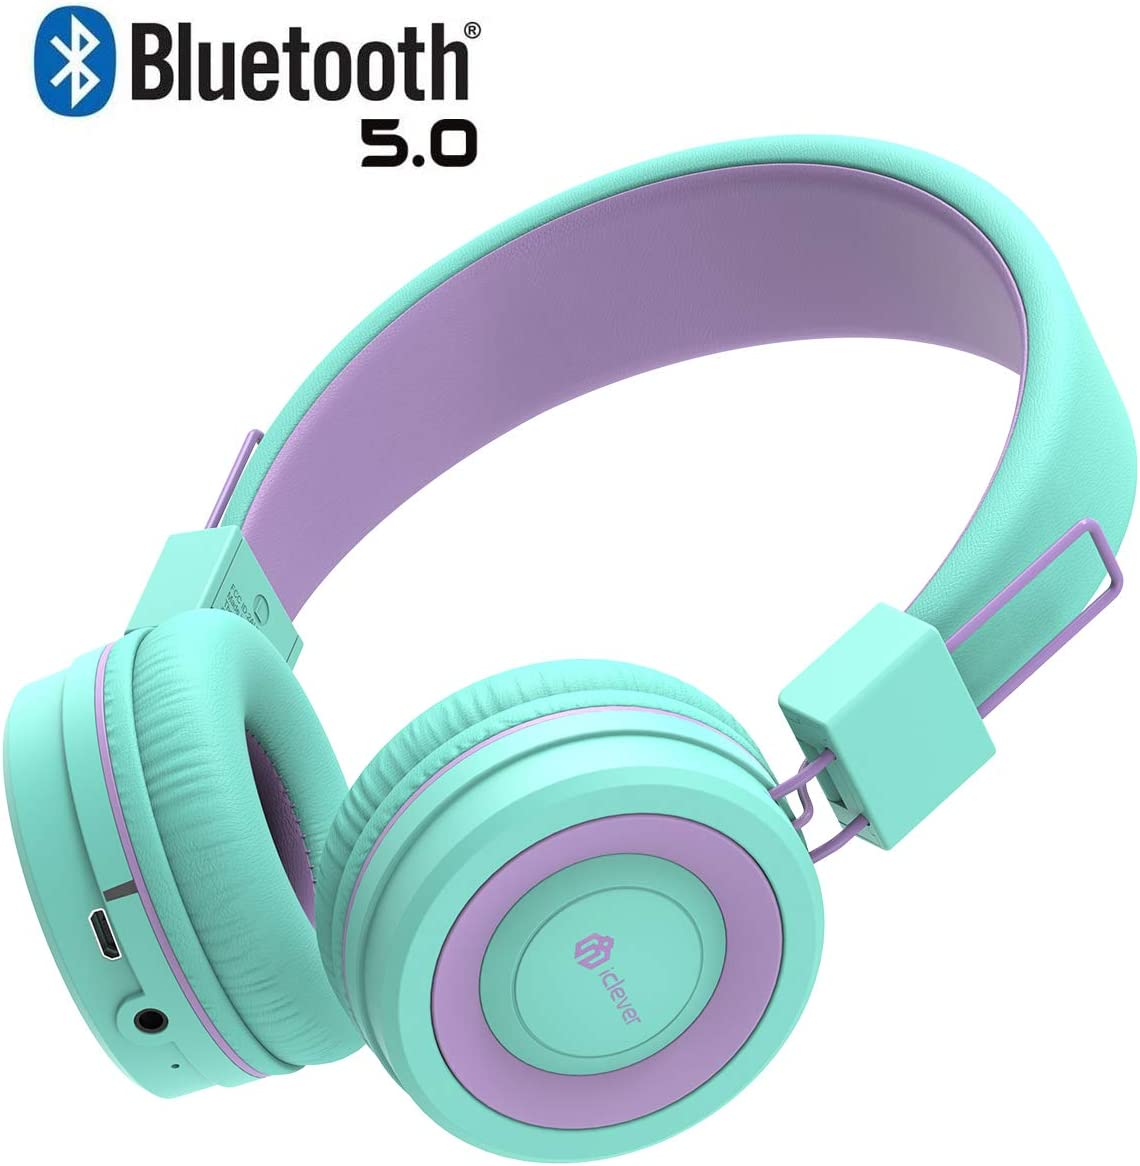 iClever Kids Bluetooth Headphones - Headphones for Kids with MIC, Volume Control Adjustable Headband, Foldable - Childrens Headphones on Ear for iPad Tablet Kindle Airplane School,Green/Purple